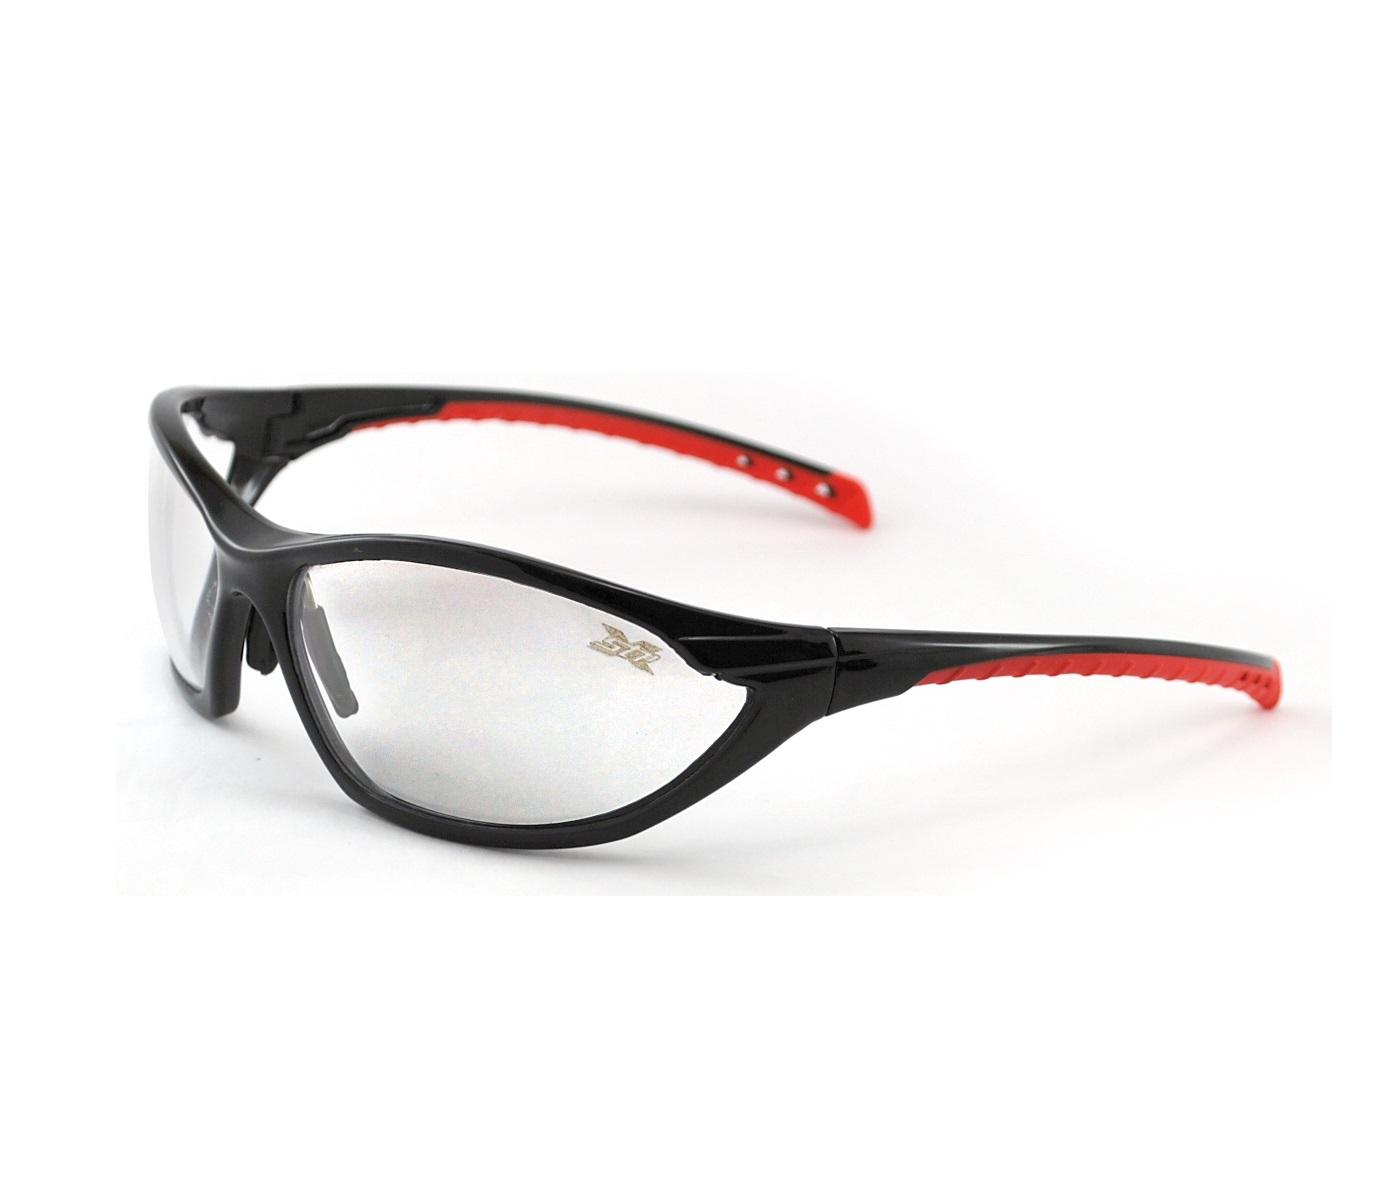 teste oculos - Vicsa EPI e042cec727